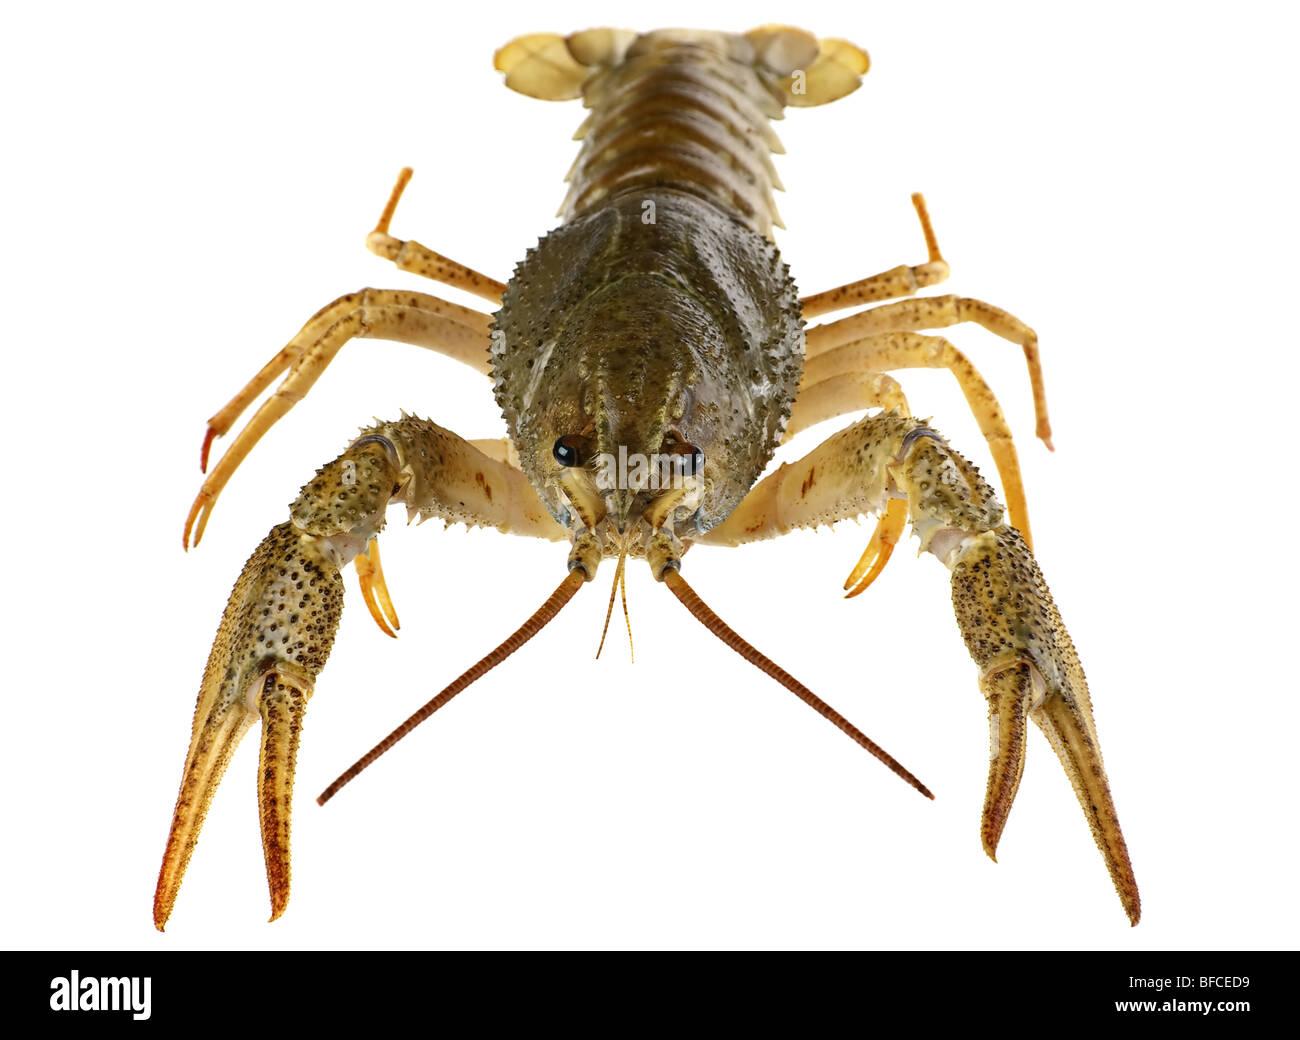 River raw crayfish closeup on white background - Stock Image